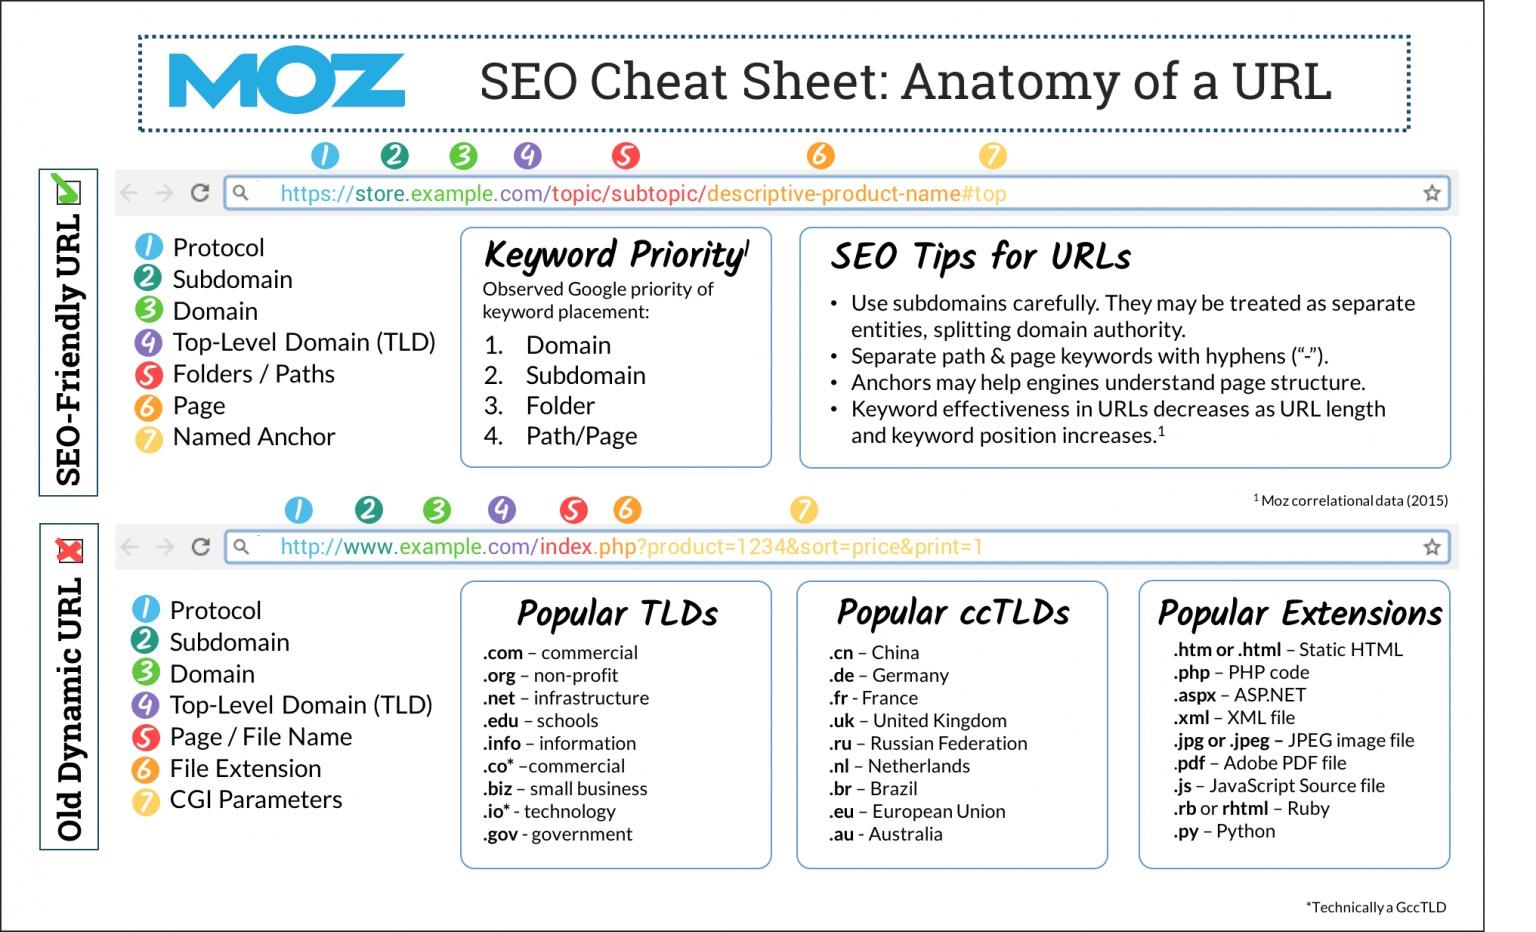 Moz SEO Cheat sheet: anatomy of an URL